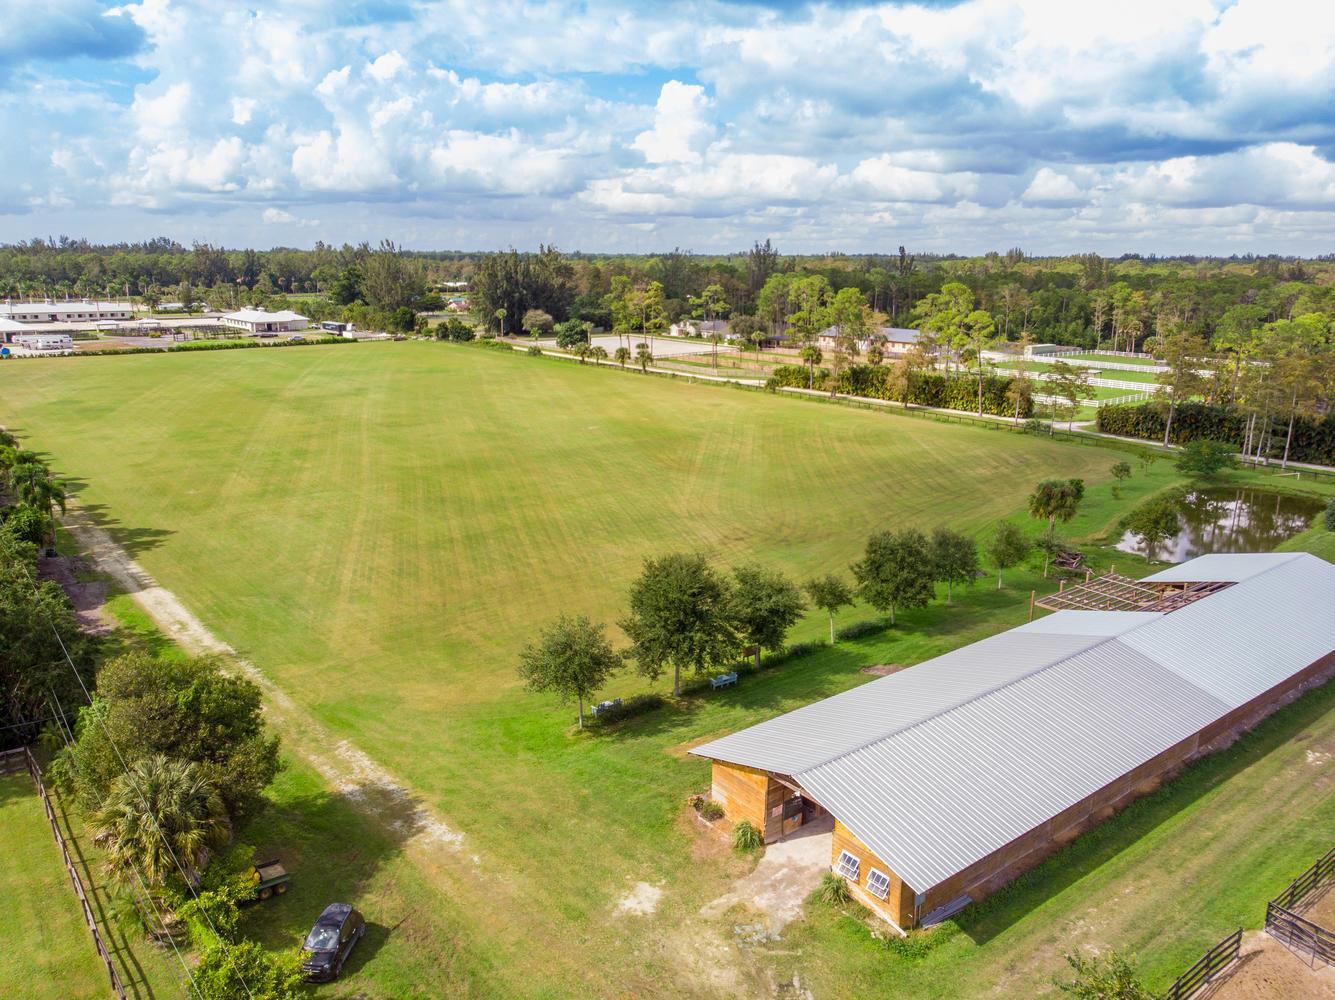 10 Acres 25 Stall Barn